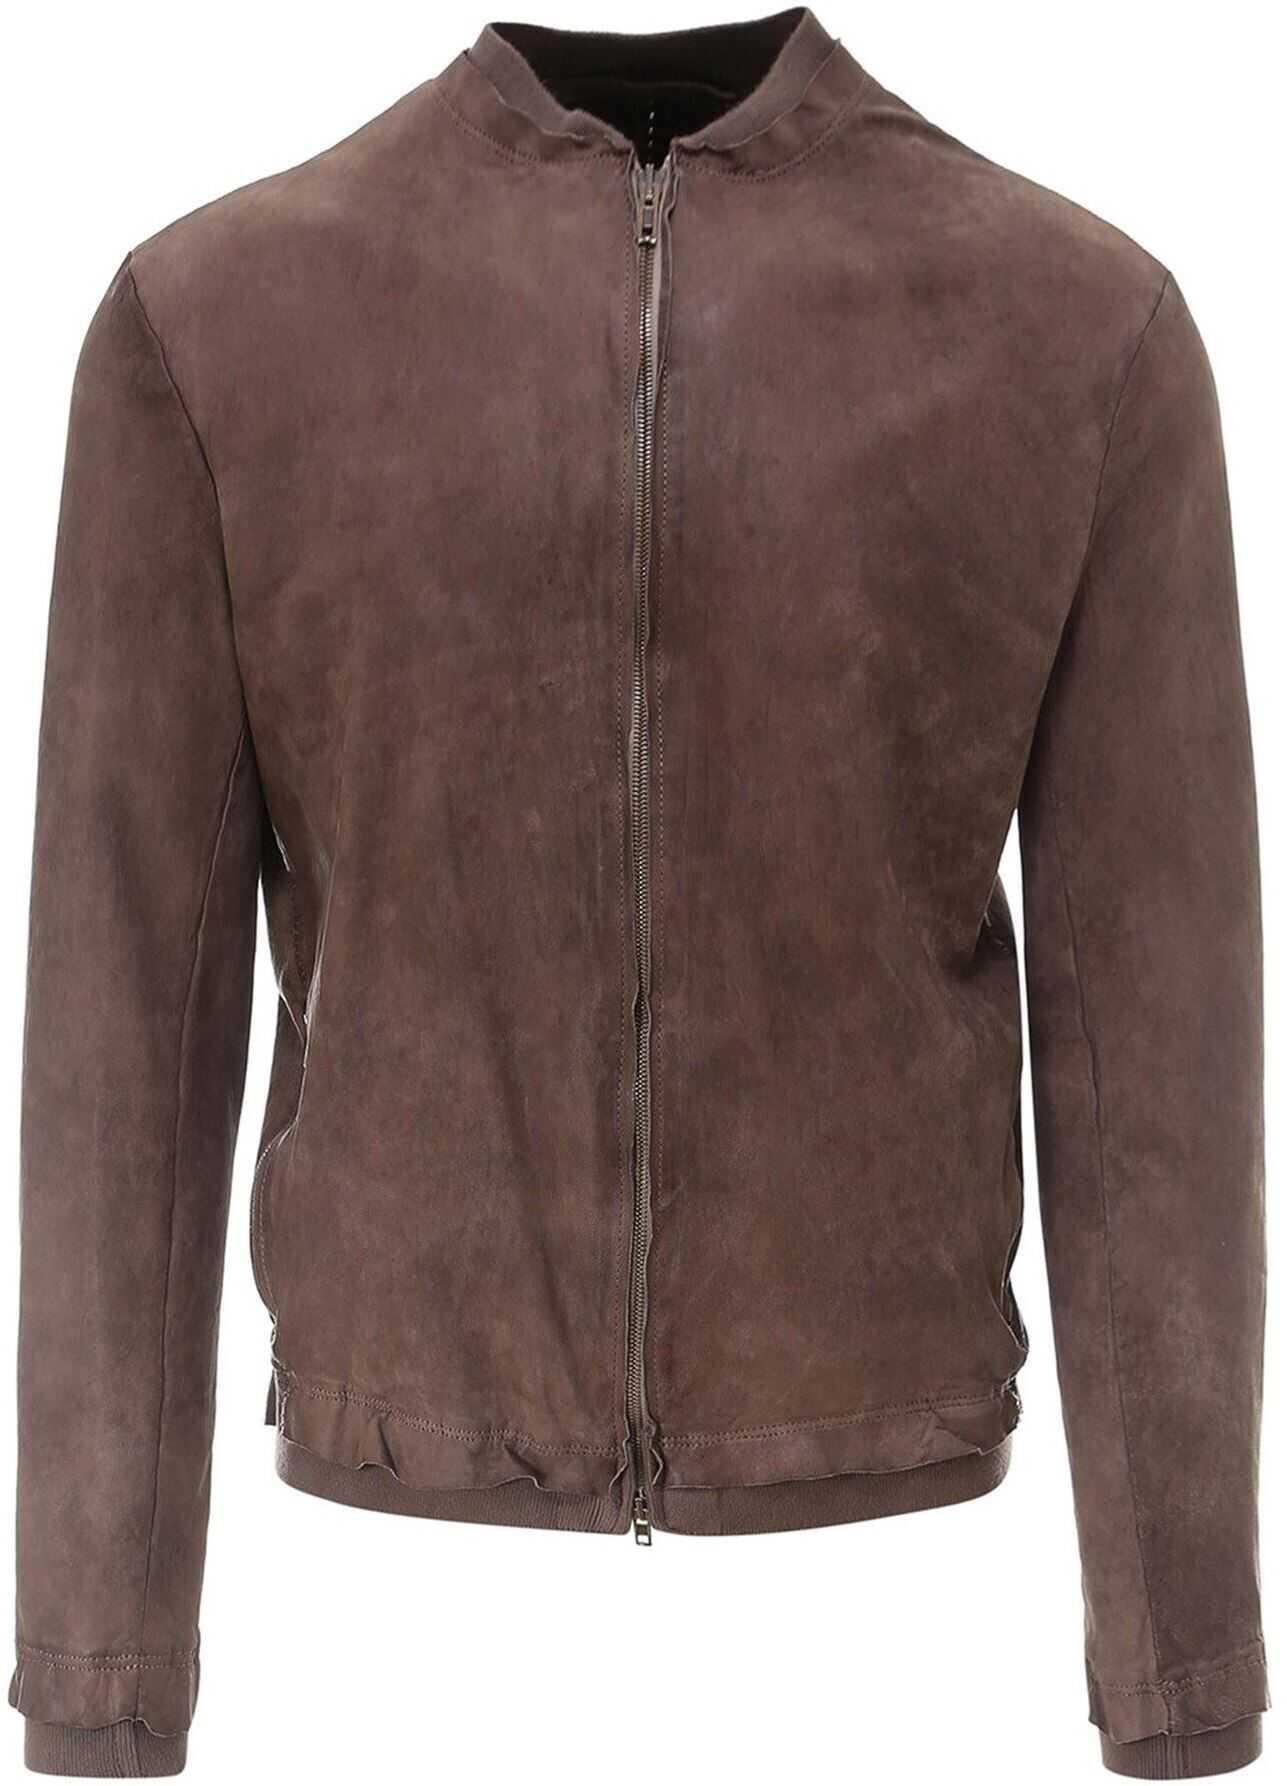 Salvatore Santoro Vintage Effect Napa Bomber Jacket In Brown Brown imagine